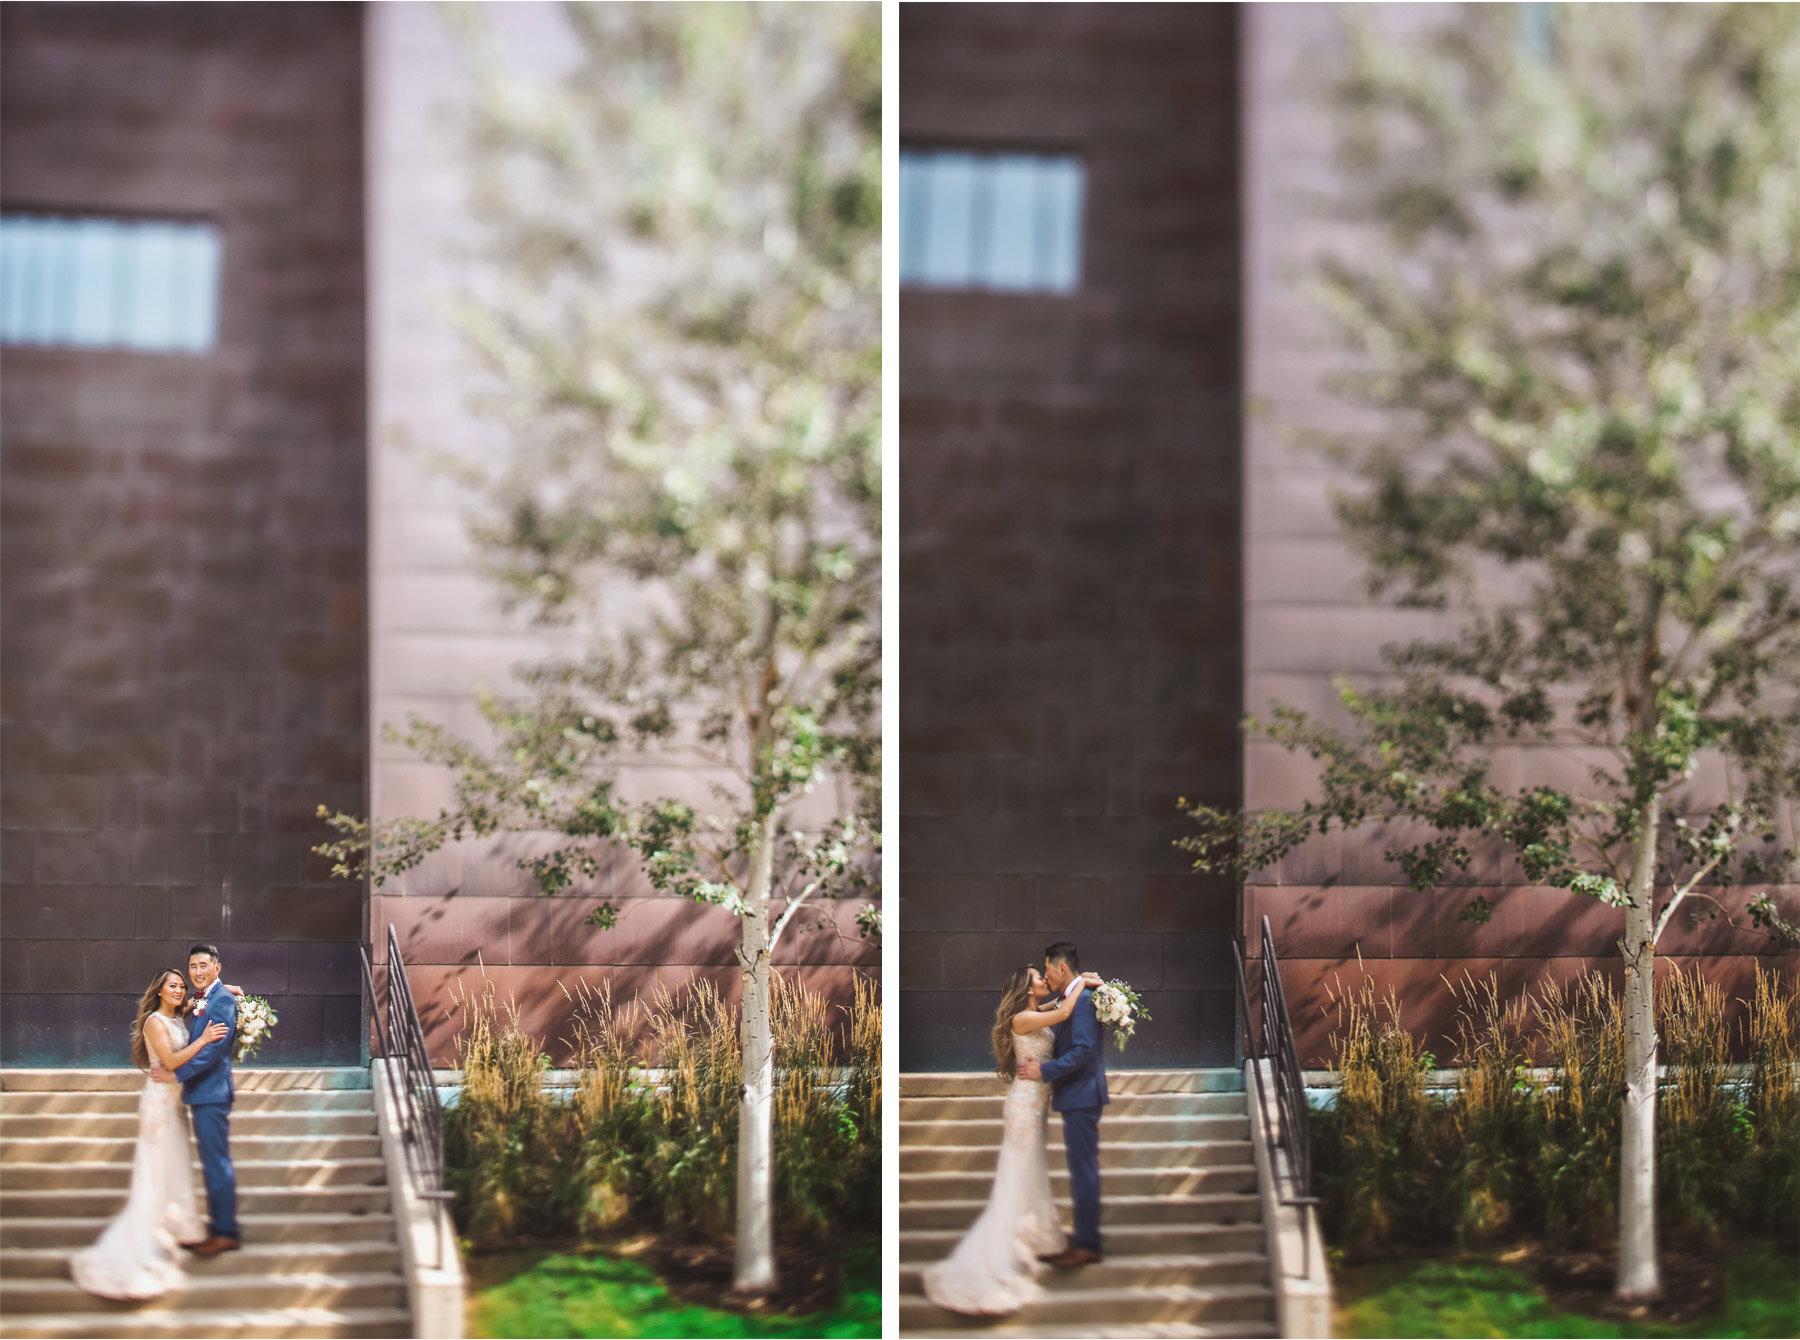 10-Vick-Photography-Minneapolis-Minnesota-Bride-Groom-Mai-&-Ross.jpg